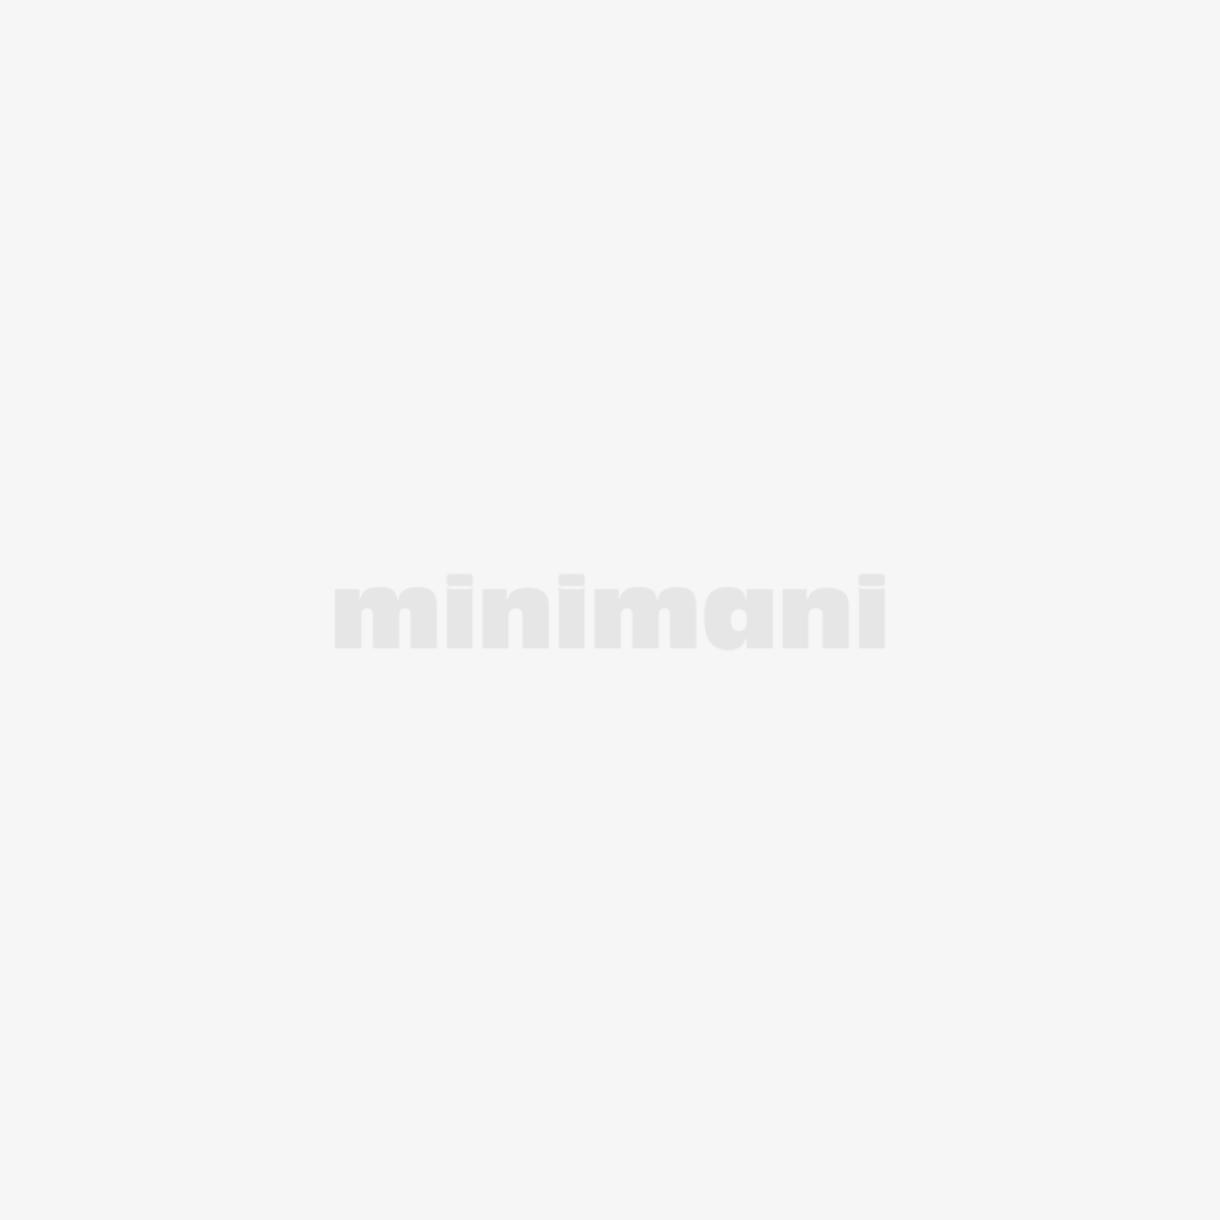 PORTWEST HIVIS 3-1 TALVITAKKI ORANSSI/NAVY KOKO XL